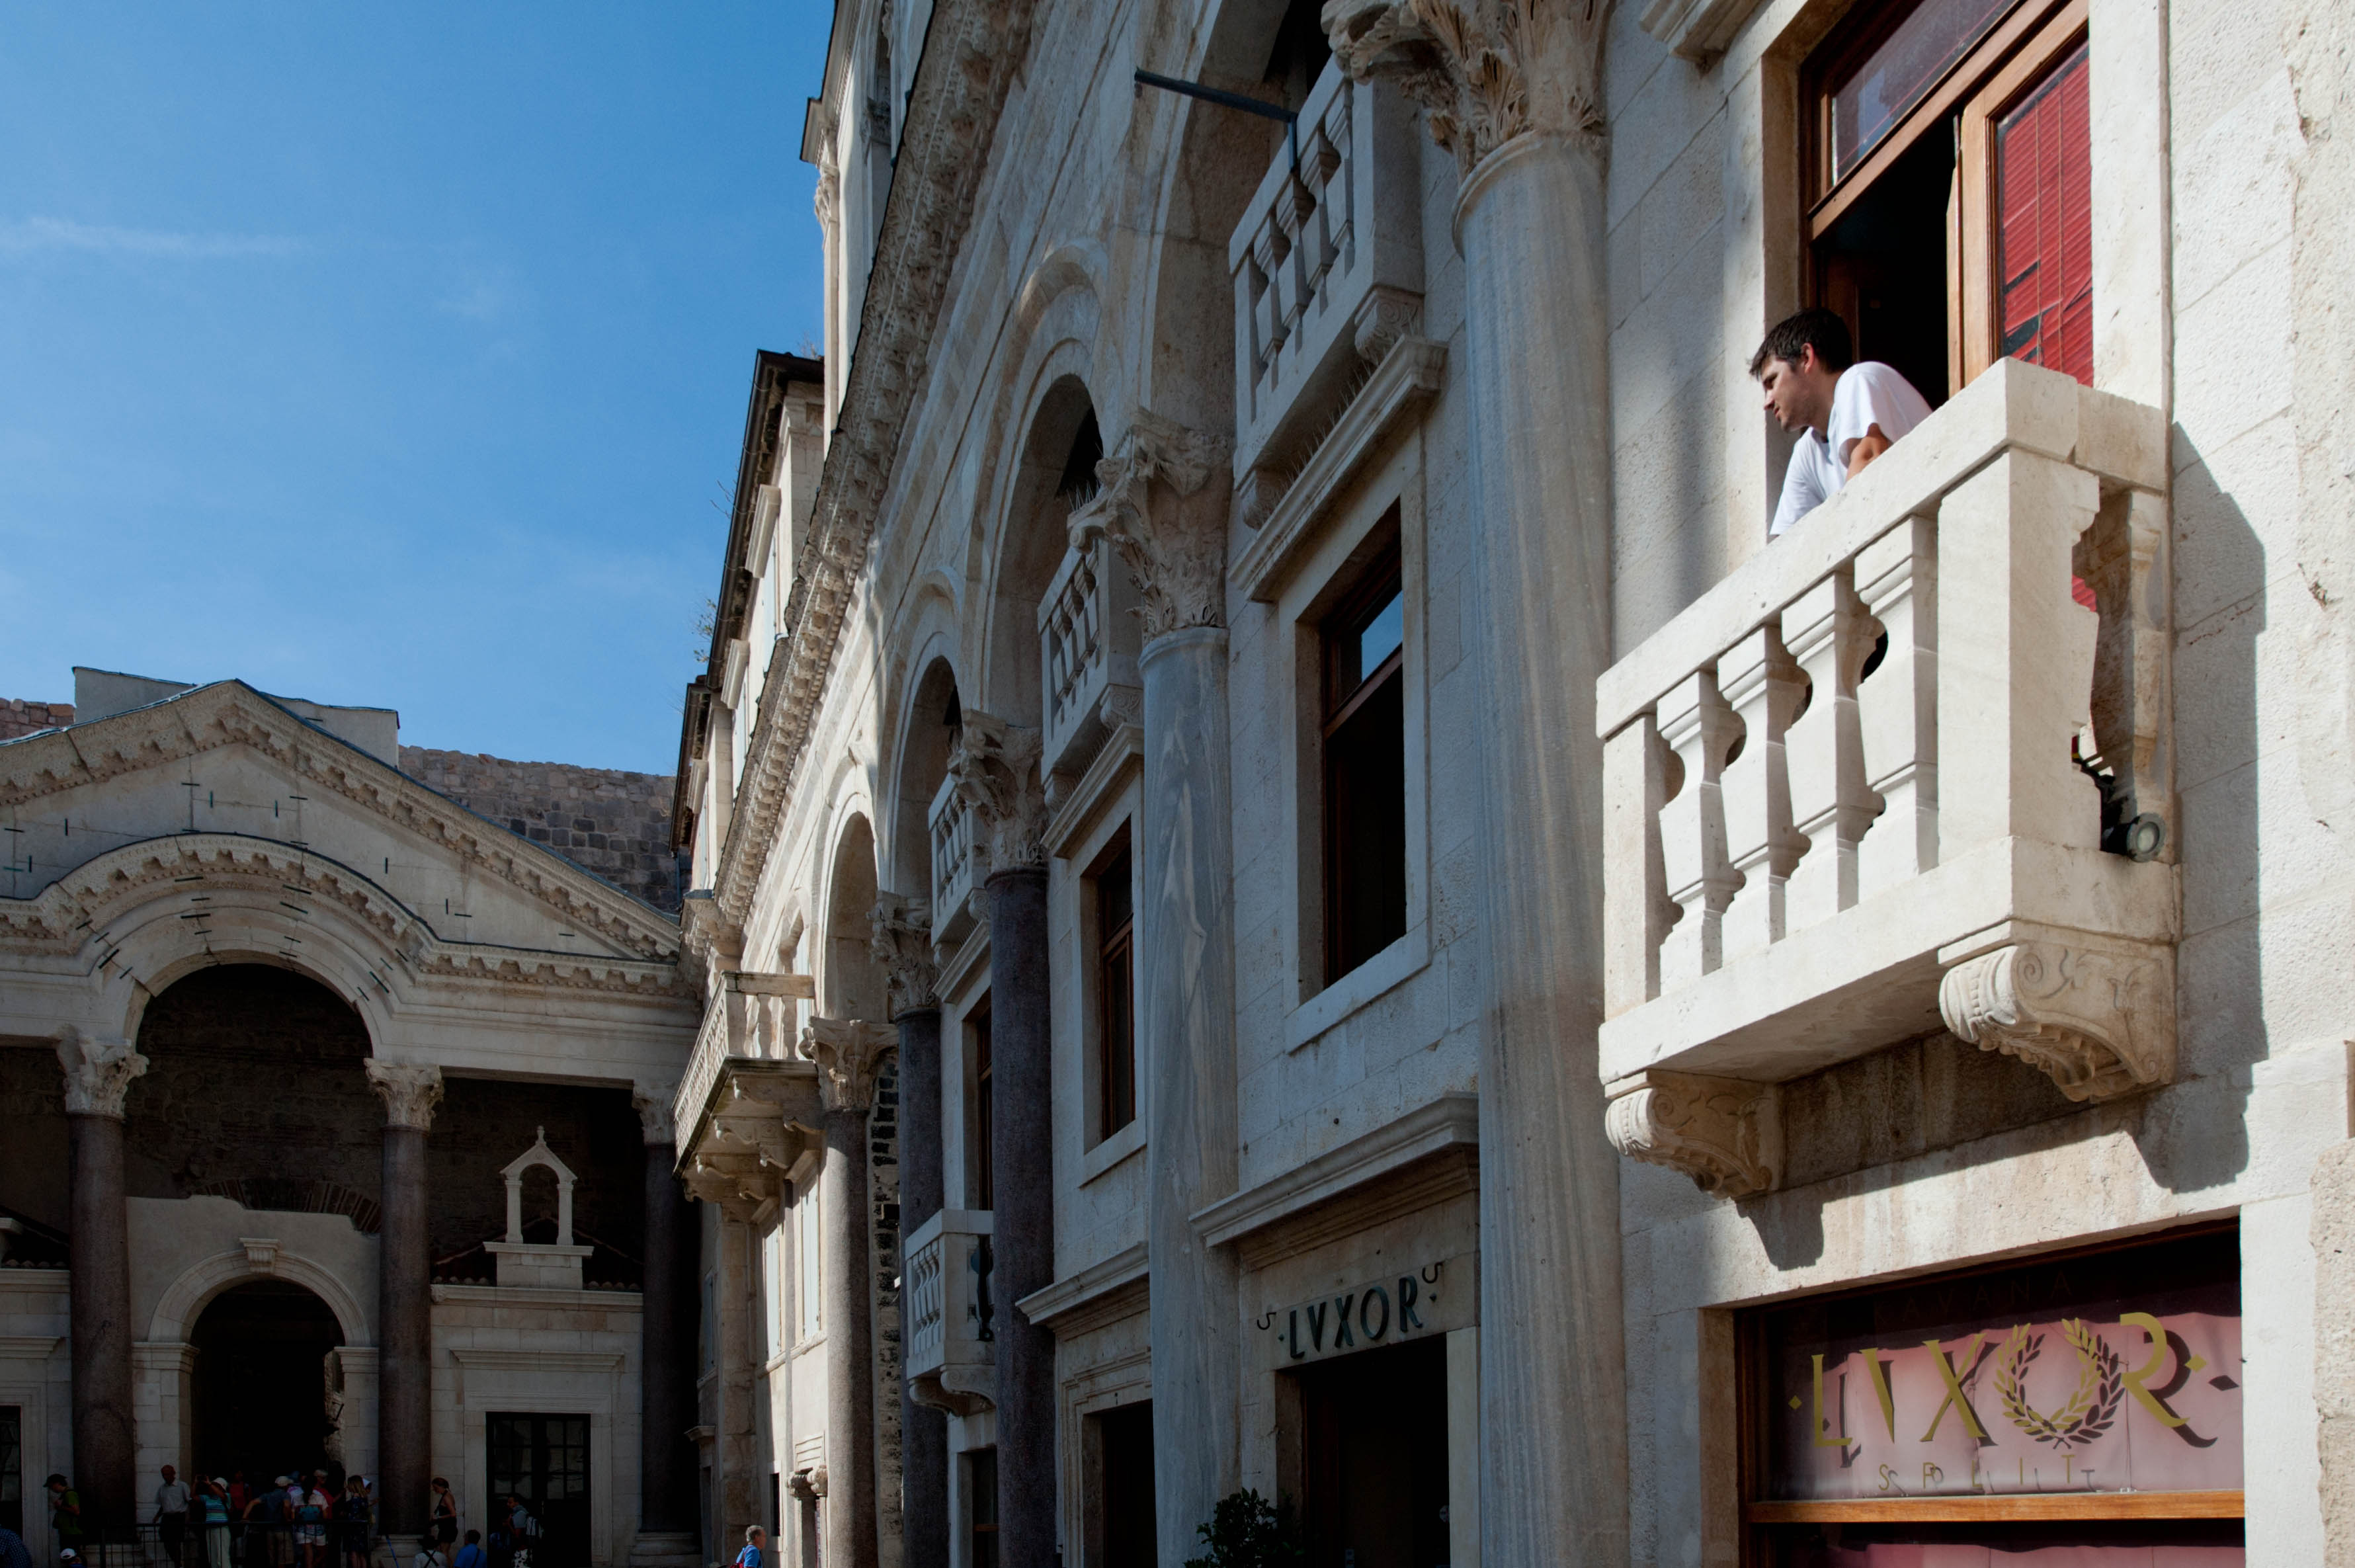 0404-Split (Dalmatie centrale)